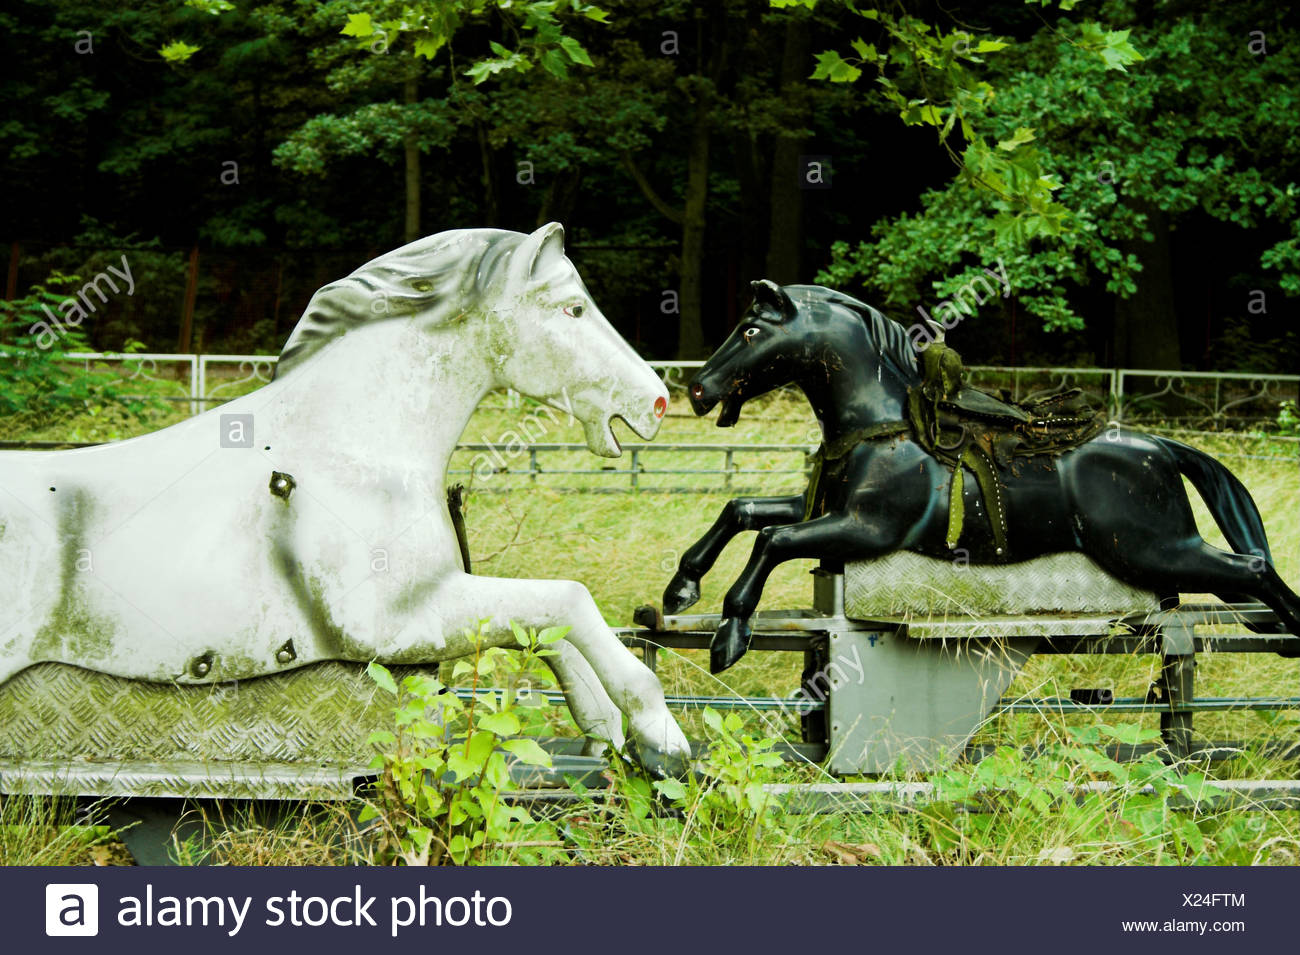 ailing,ride,horse figure - Stock Image